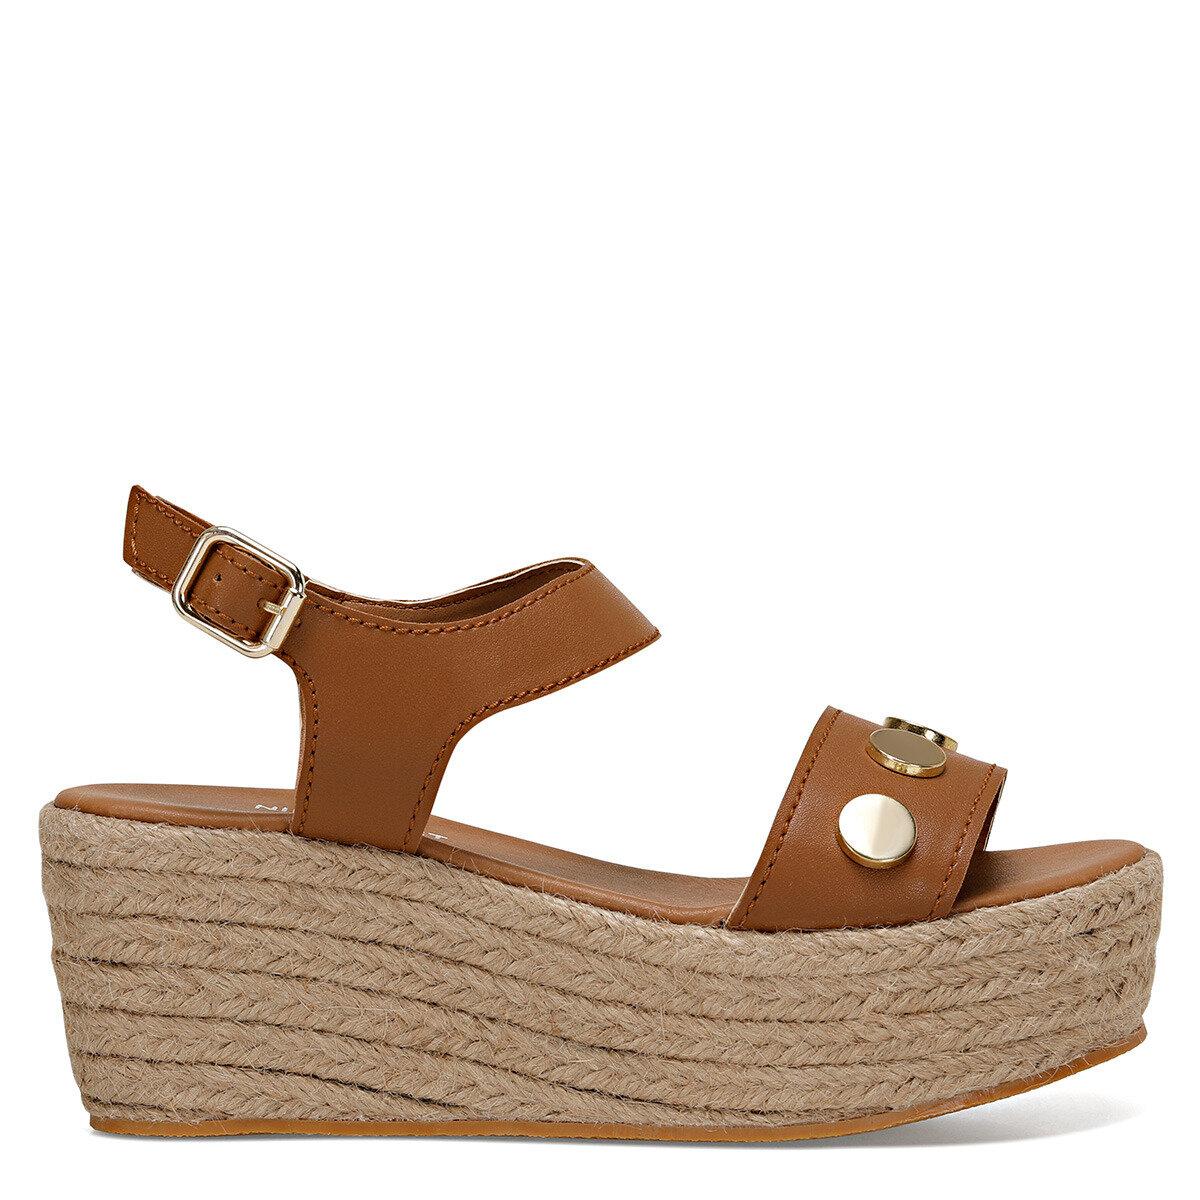 VALADON Taba Kadın Dolgu Topuklu Sandalet